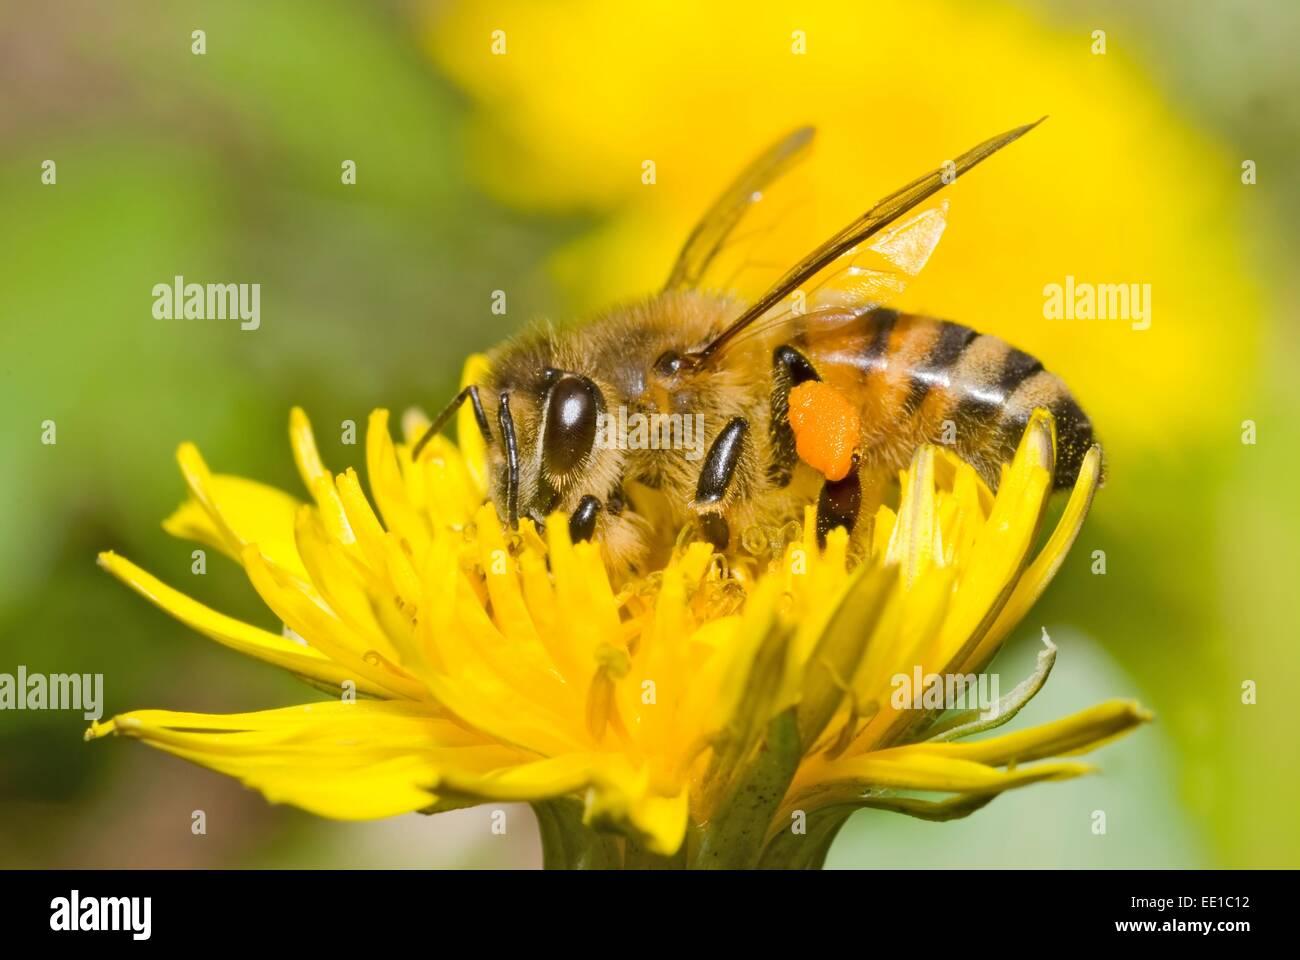 A Western Honey Bee (Apis mellifera) on a Dandelion flower (Taraxacum) - Stock Image